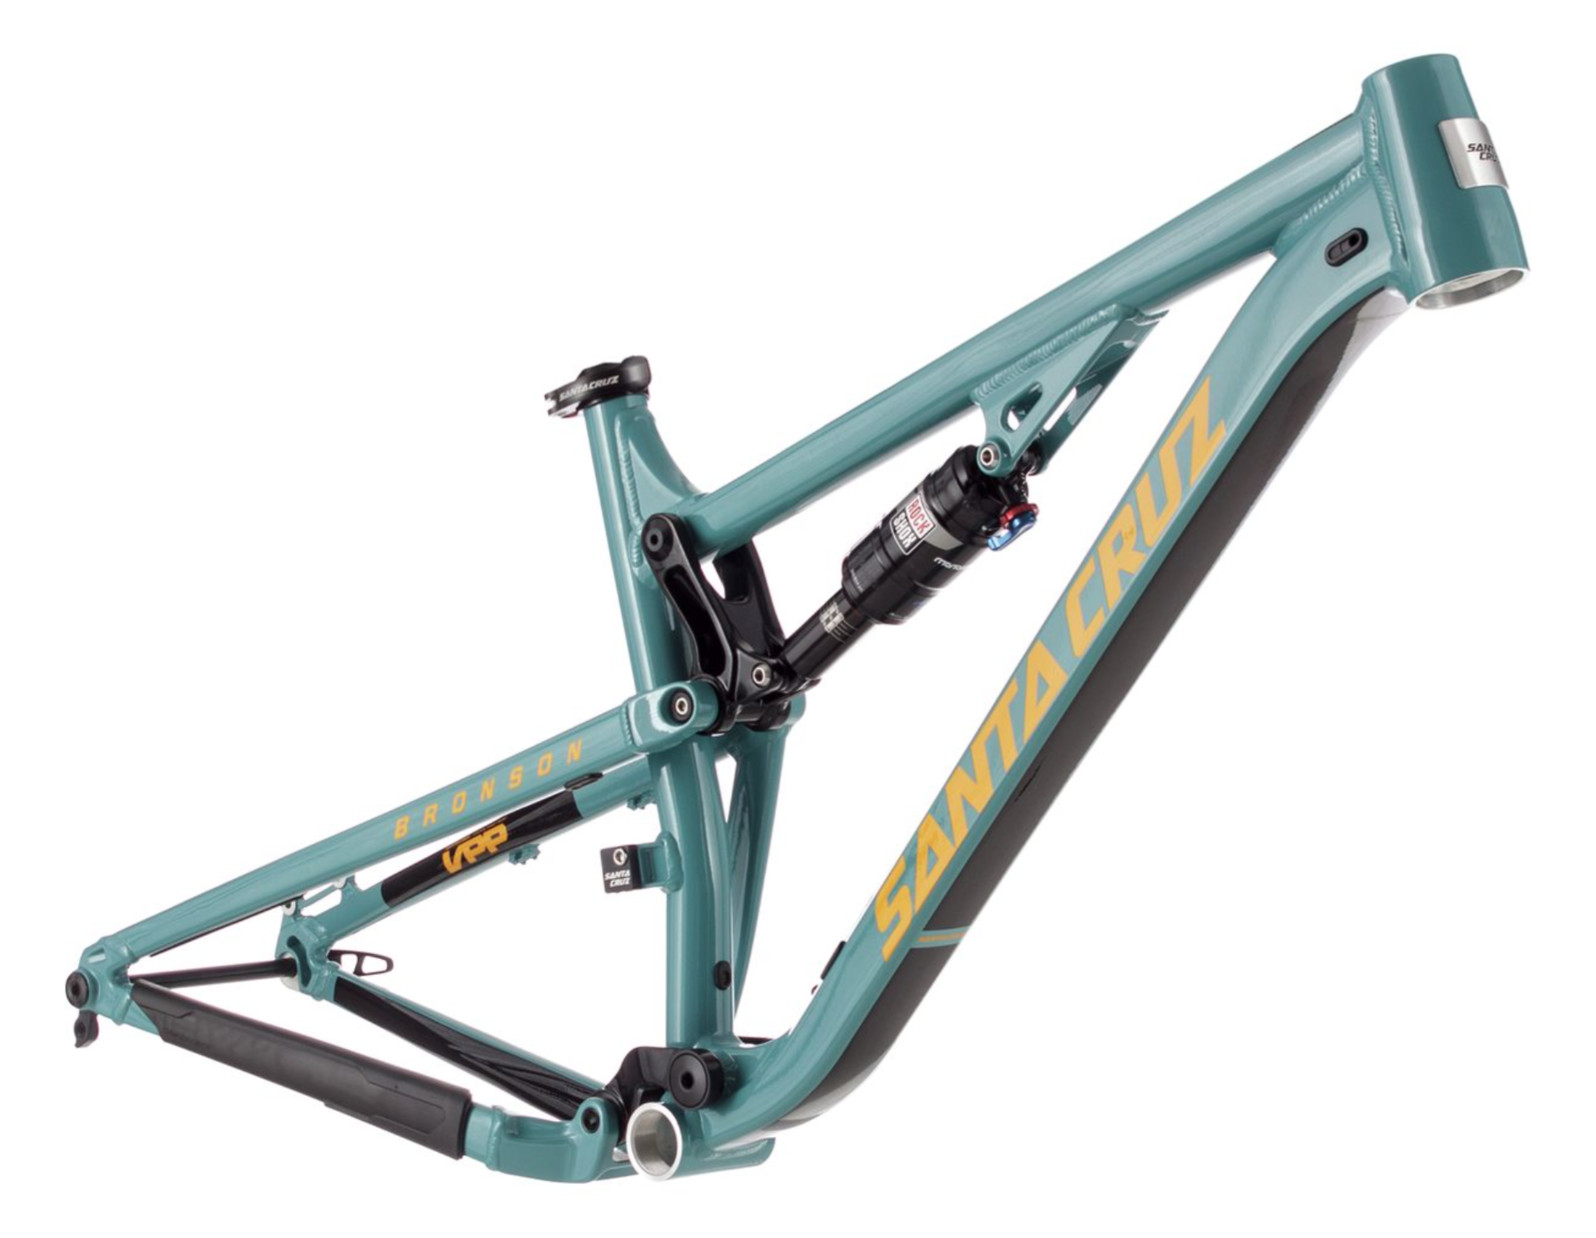 Santa Cruz Bicycles Bronson 2.0 Alloy Frame - 2017